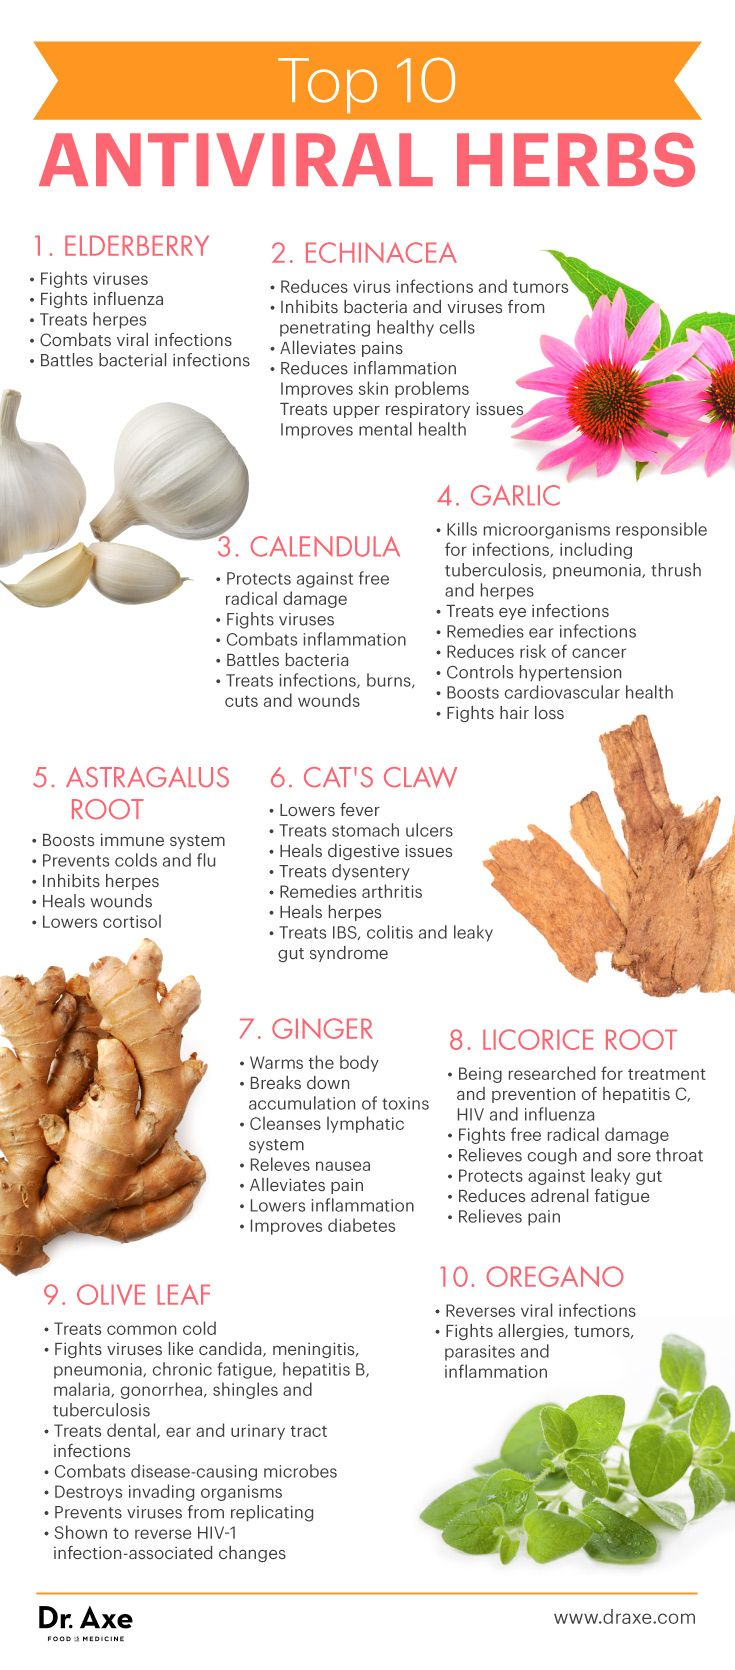 Top 10 antiviral herbs - Dr. Axe http://www.draxe.com #health #holistic #natural